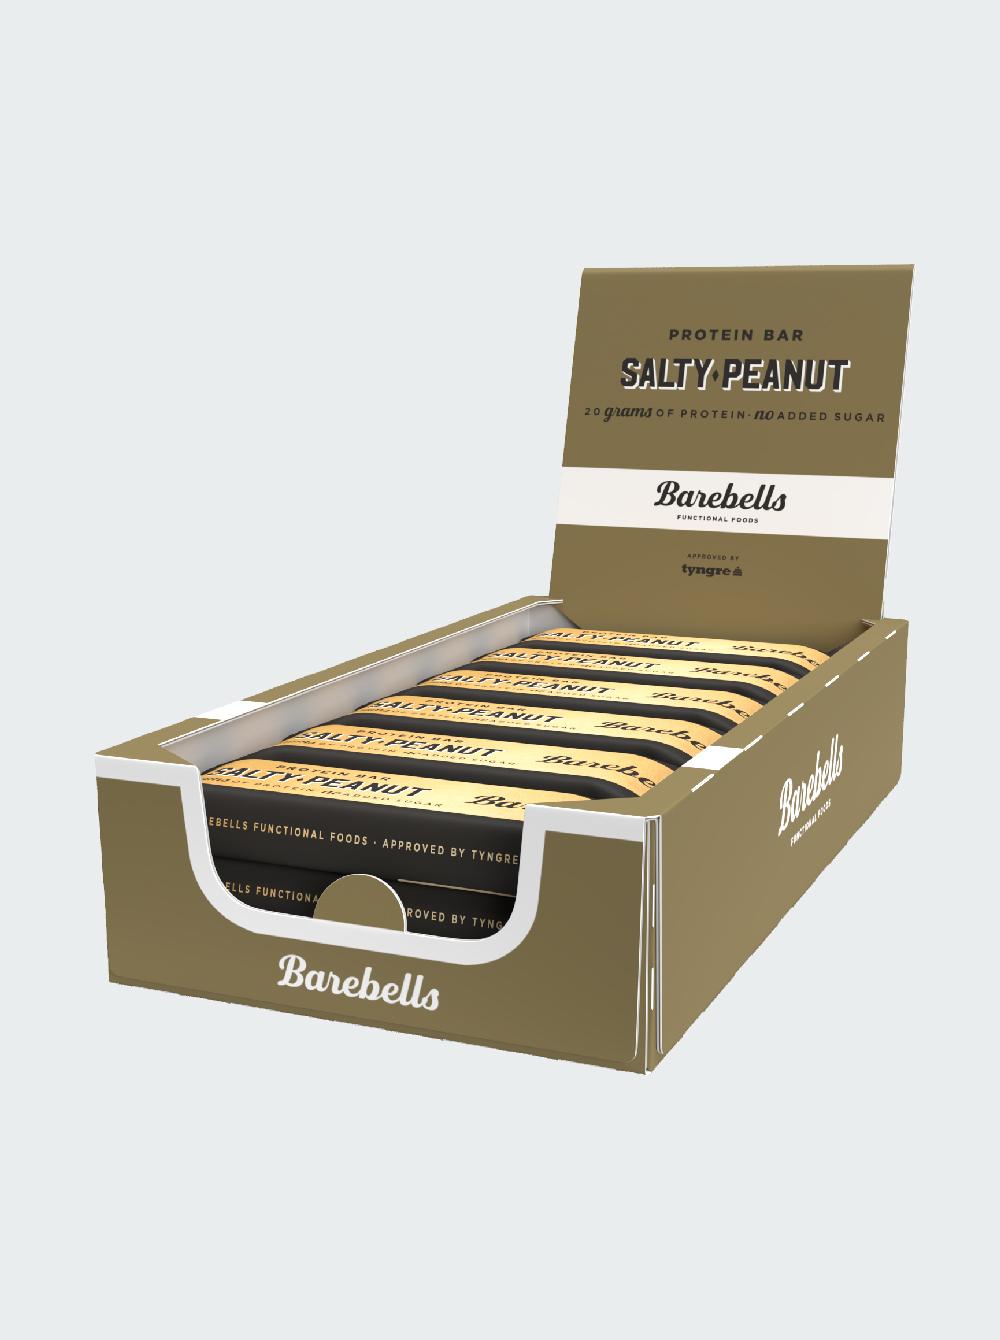 Barebells Salty Peanut 12-pack